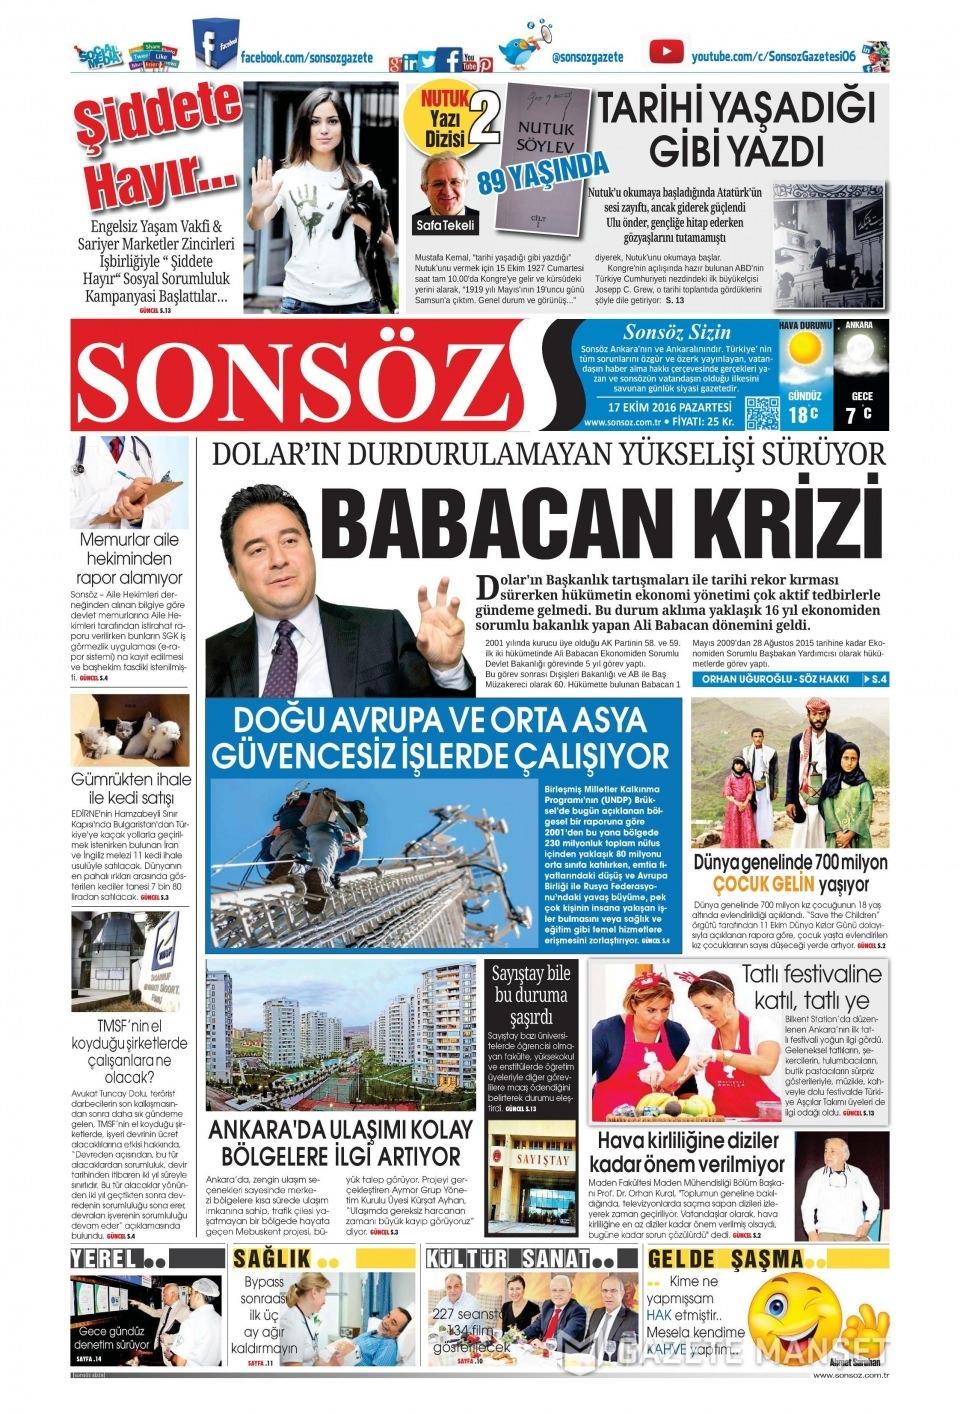 17 Ekim Pazartesi gazete manşetleri 21